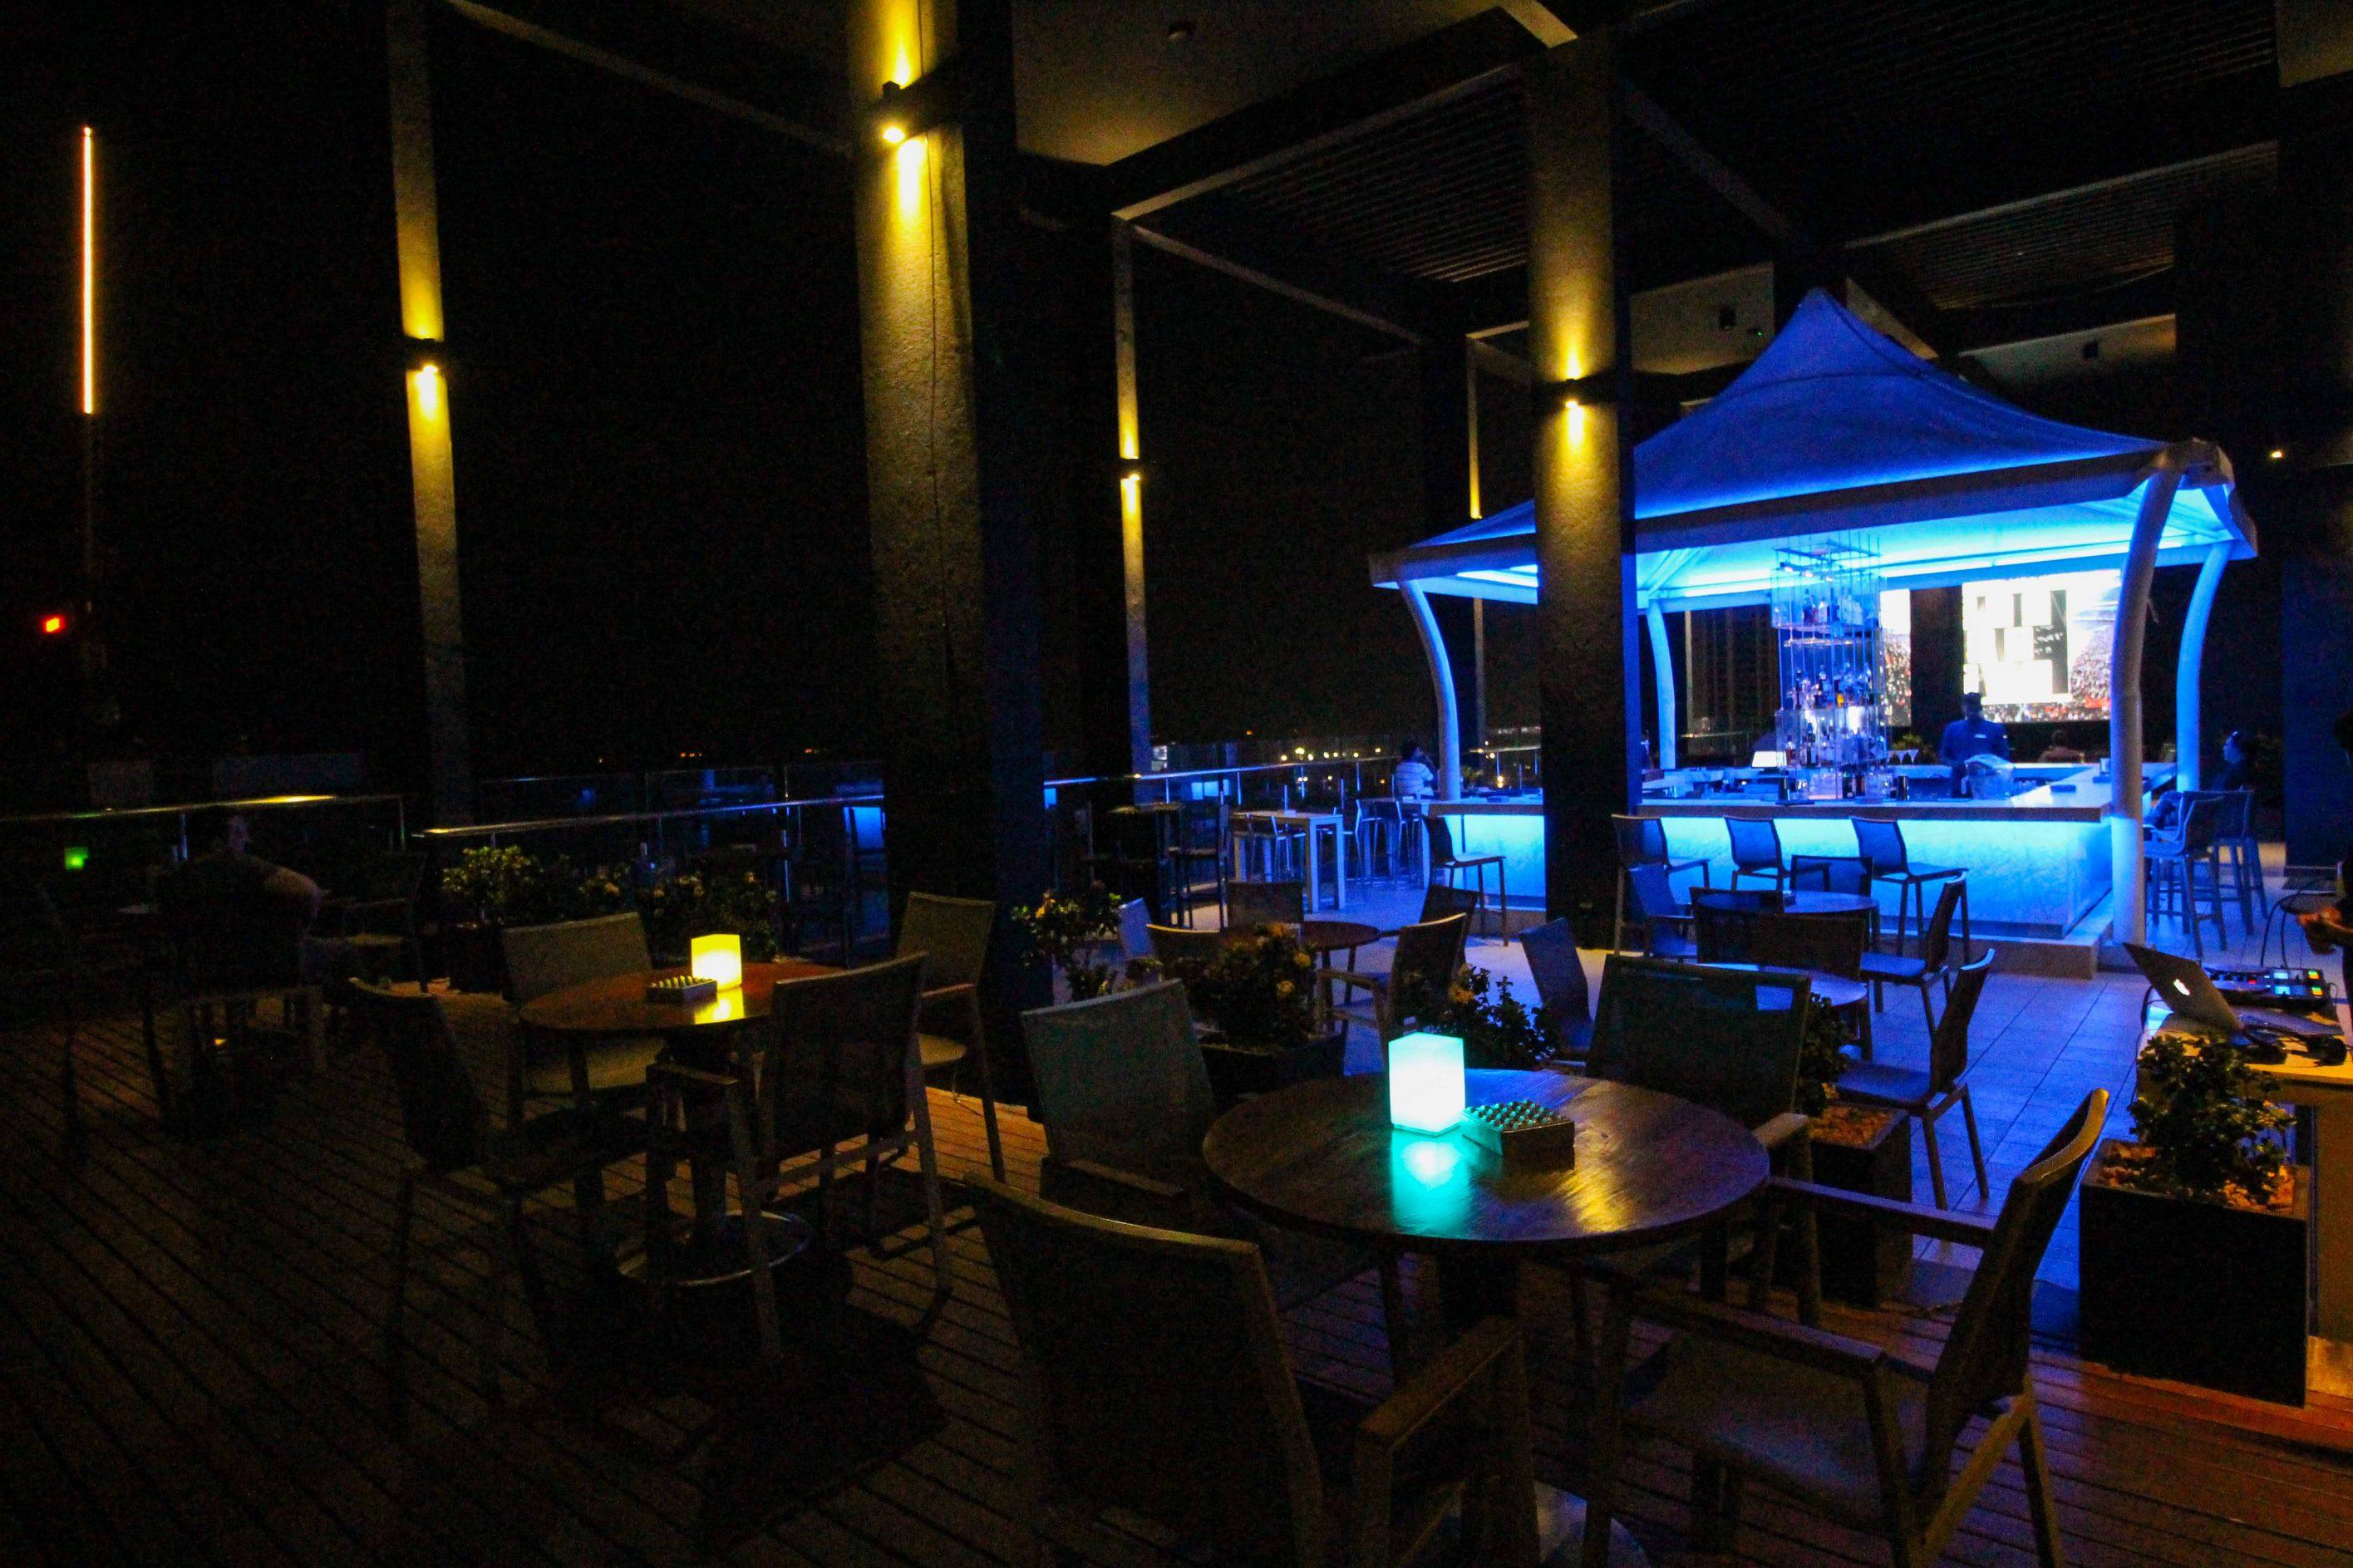 Rooftop Bar Colombo Skyline Mövenpick Colombo Hotel Reiseblog Brinisfashionbook bestes Hotel Sri Lanka 3